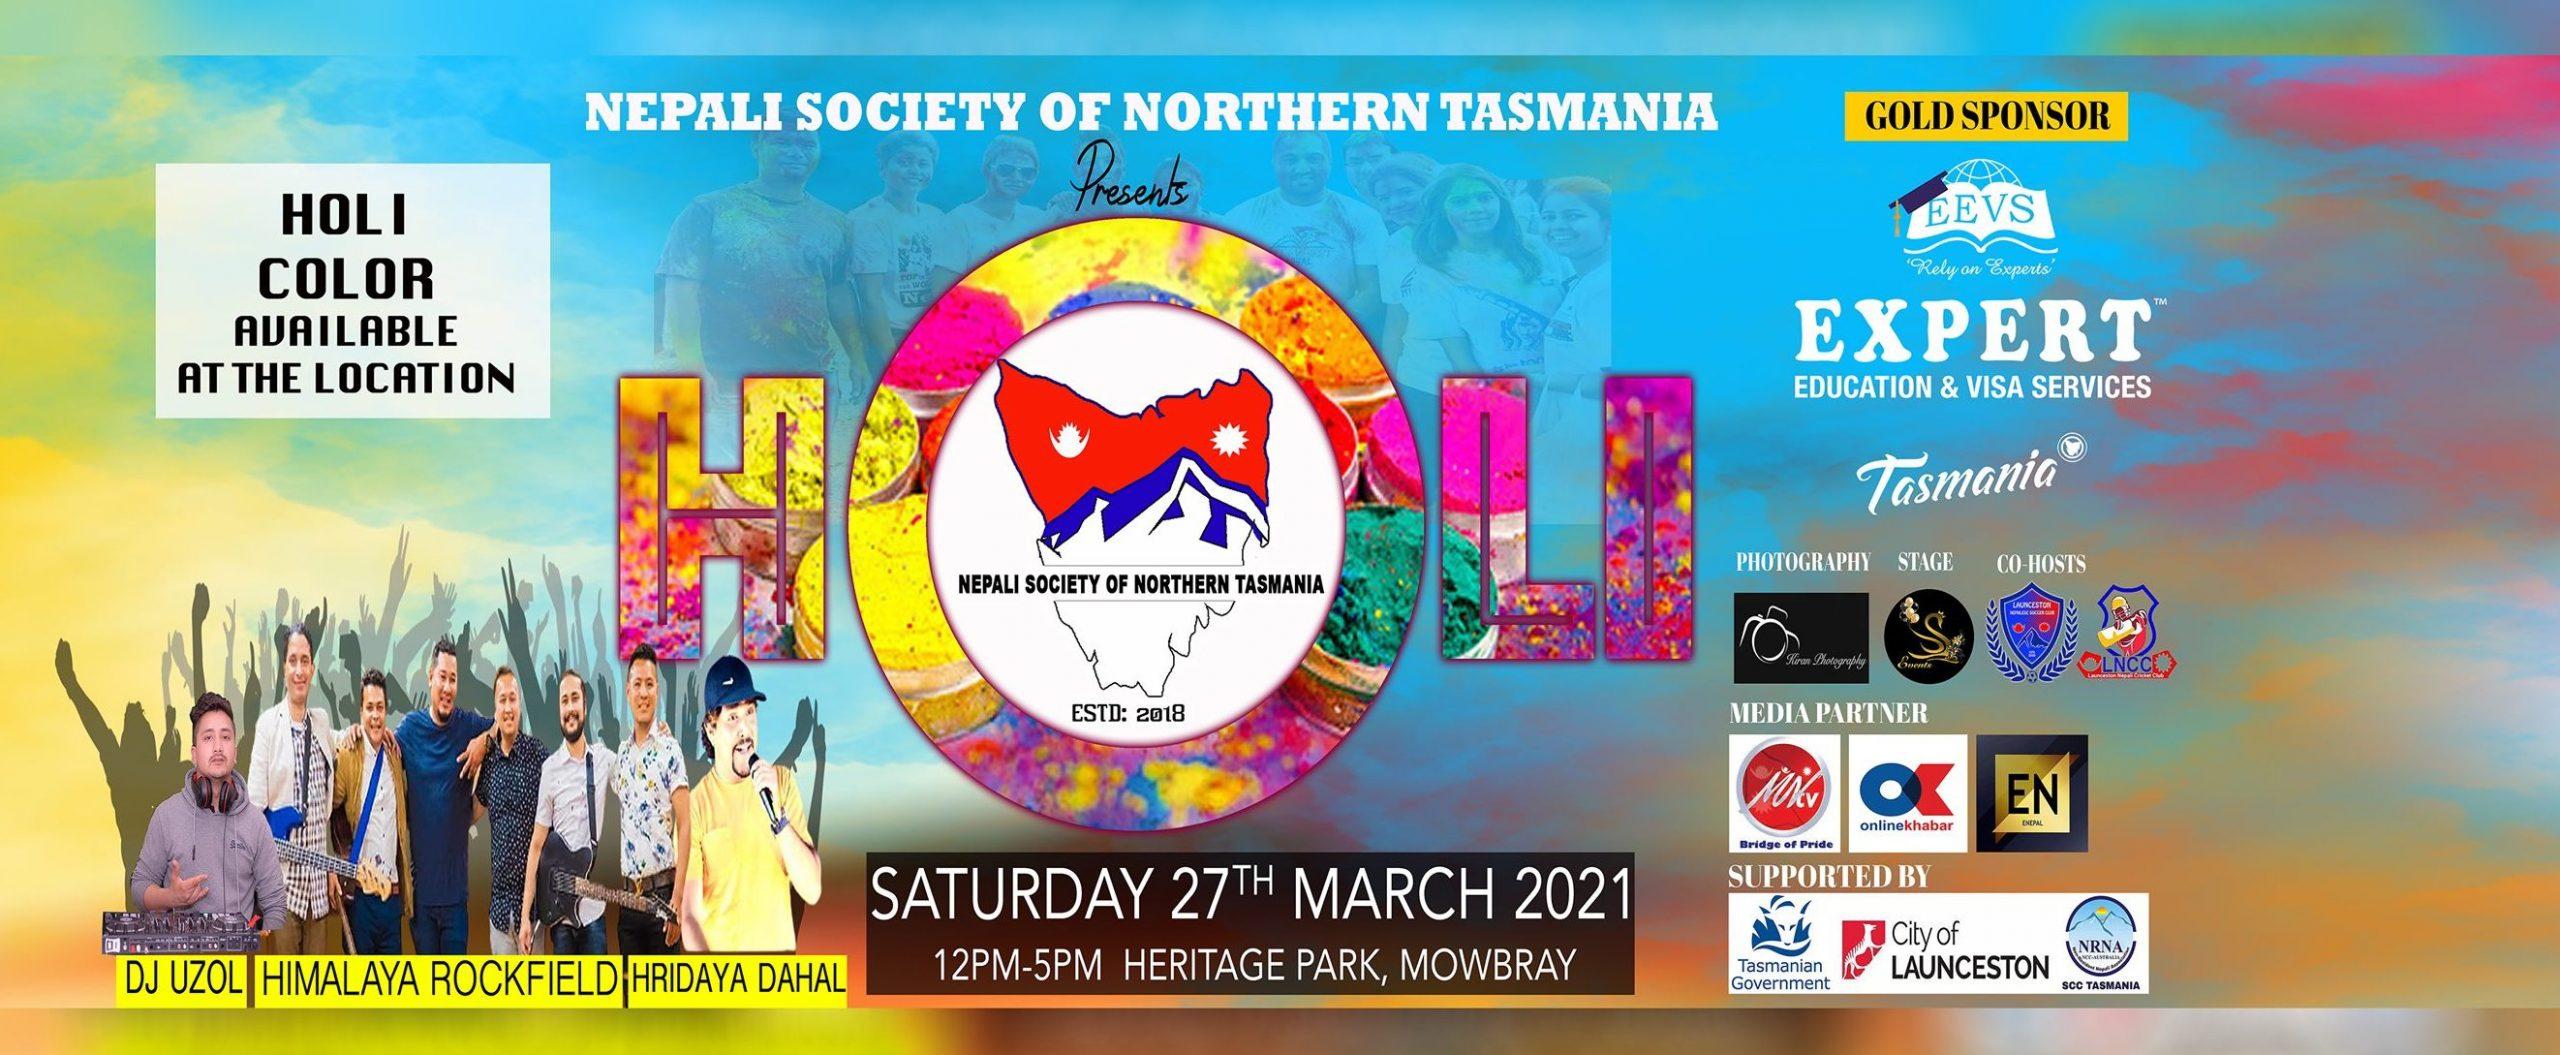 Nepalese Community organise Holi festival in Launceston northern Tasmania, Australia